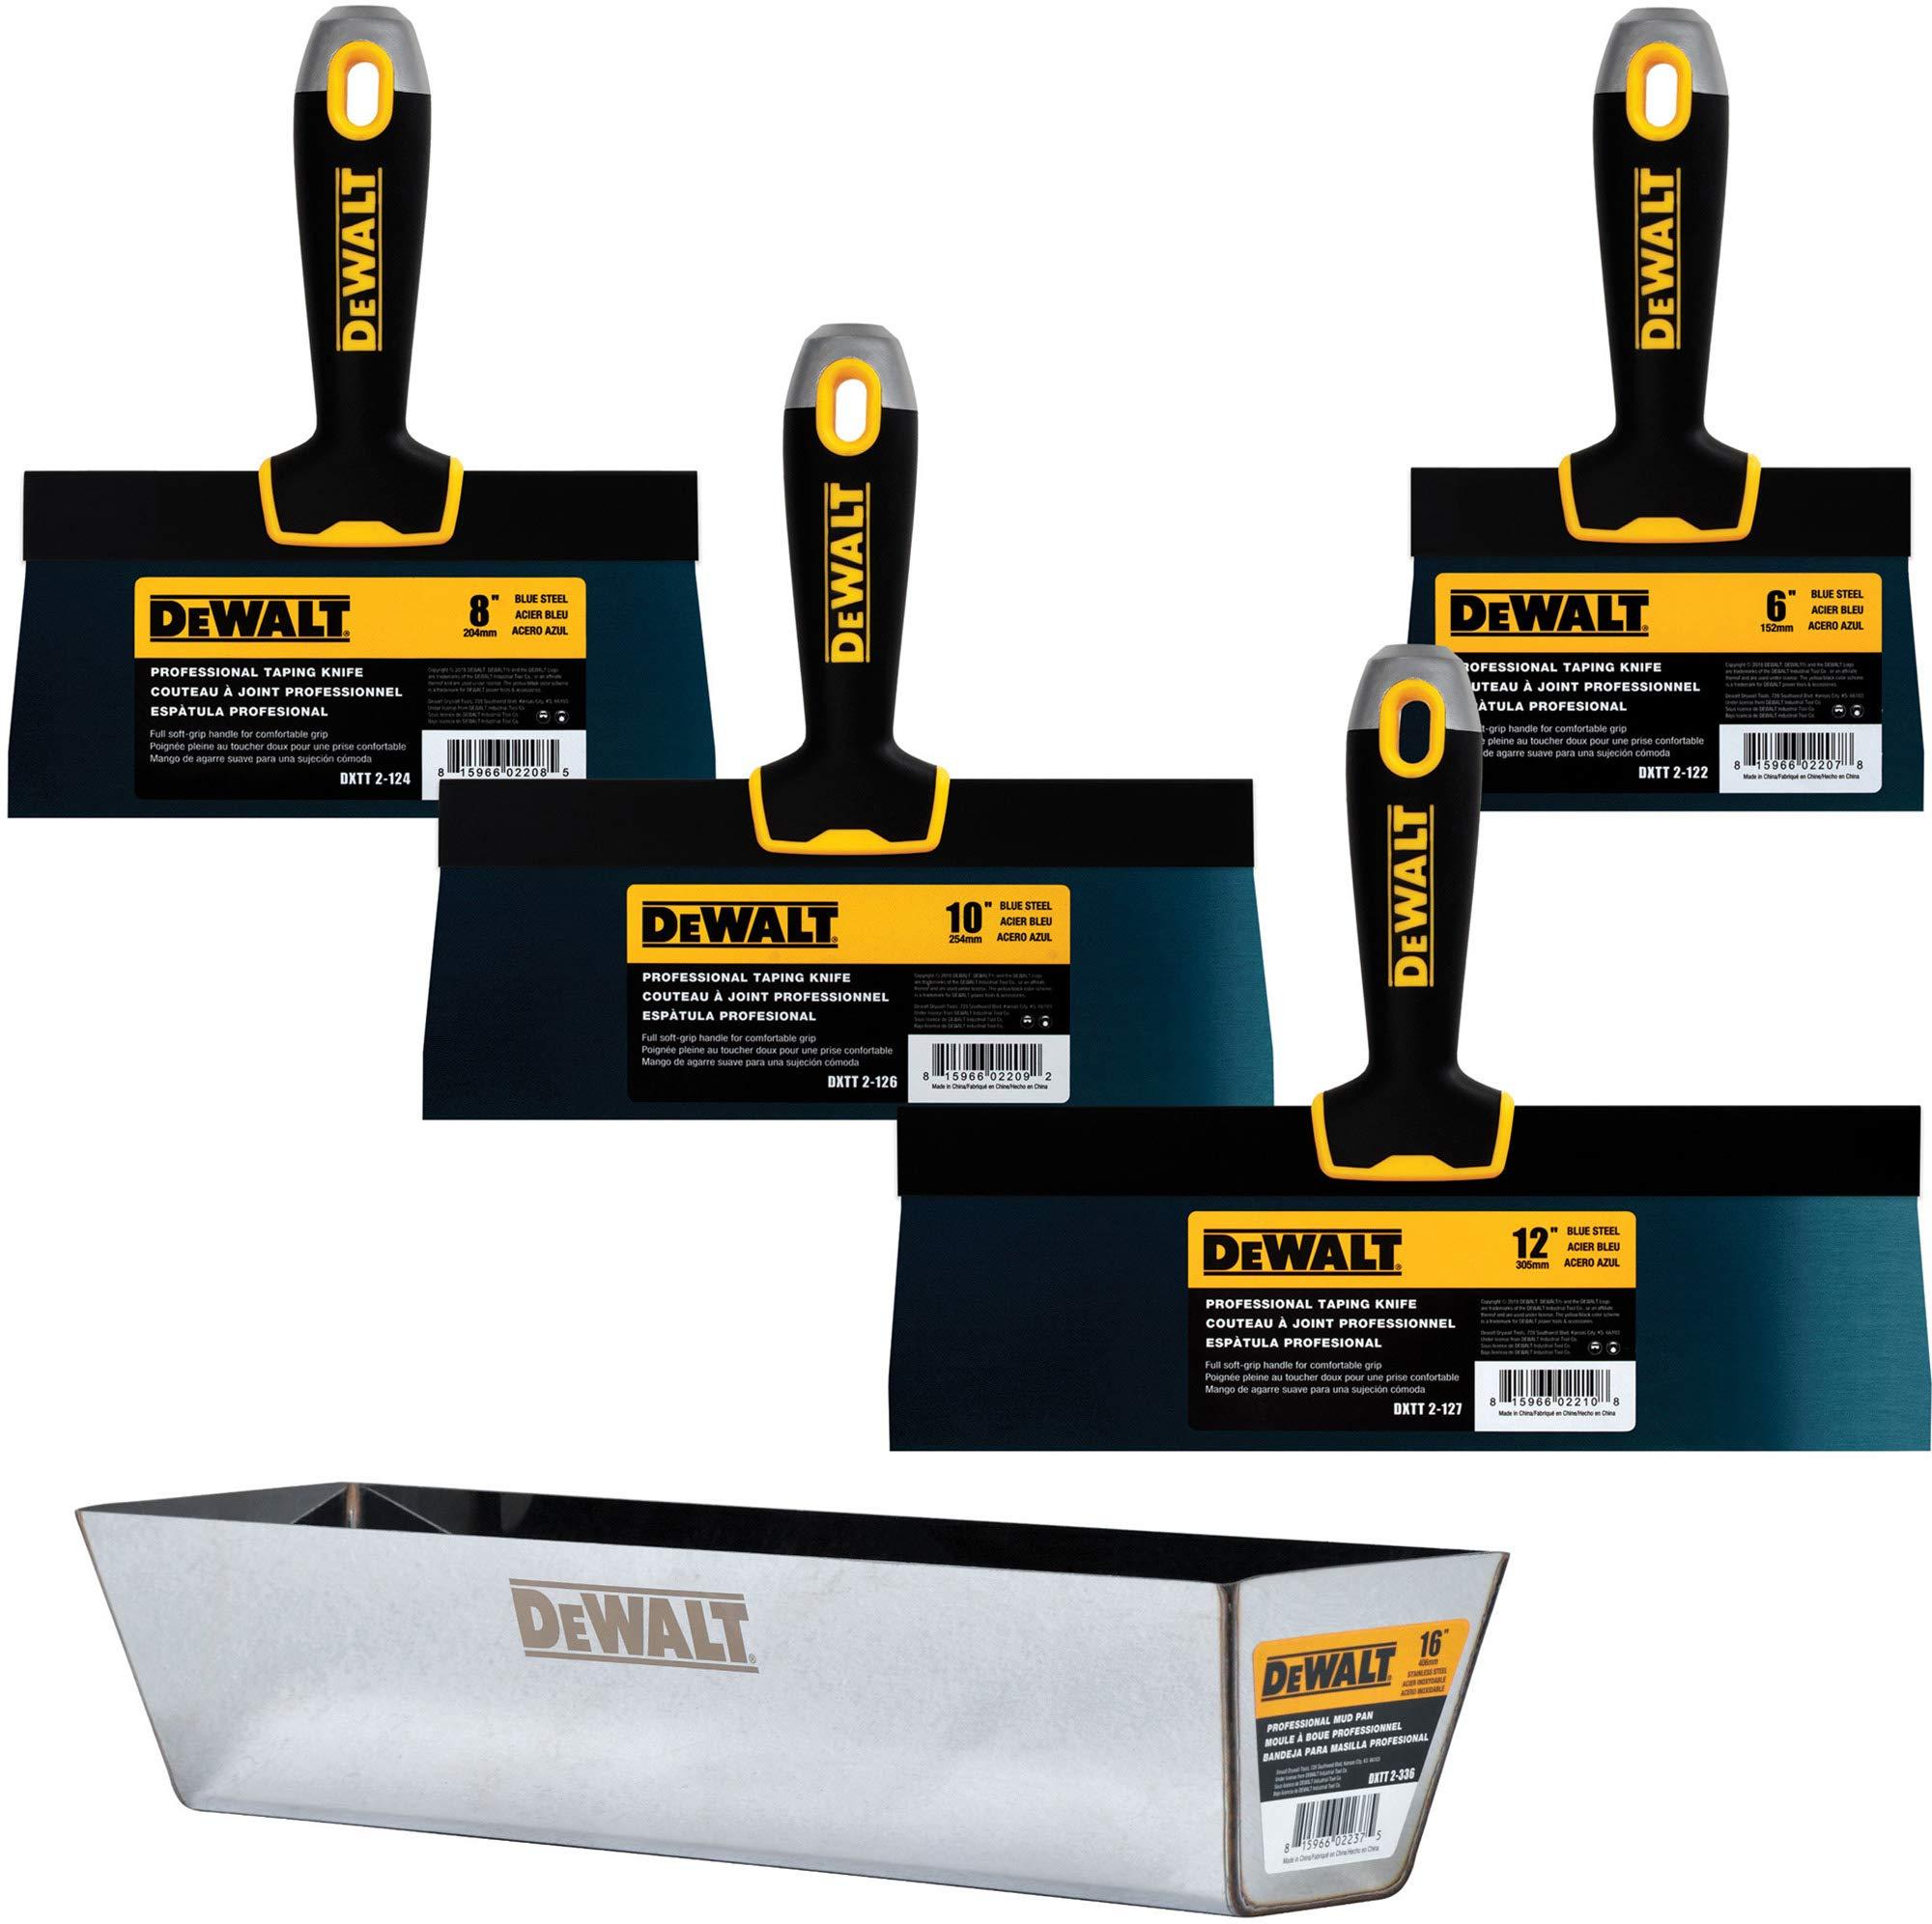 DEWALT Blue Steel Taping Knife & Mud Pan Set + FREE BONUS 6'' Soft Grip Putty Knife | 8/10/12-Inches | Soft Grip Handles | DXTT-3-163 by DEWALT